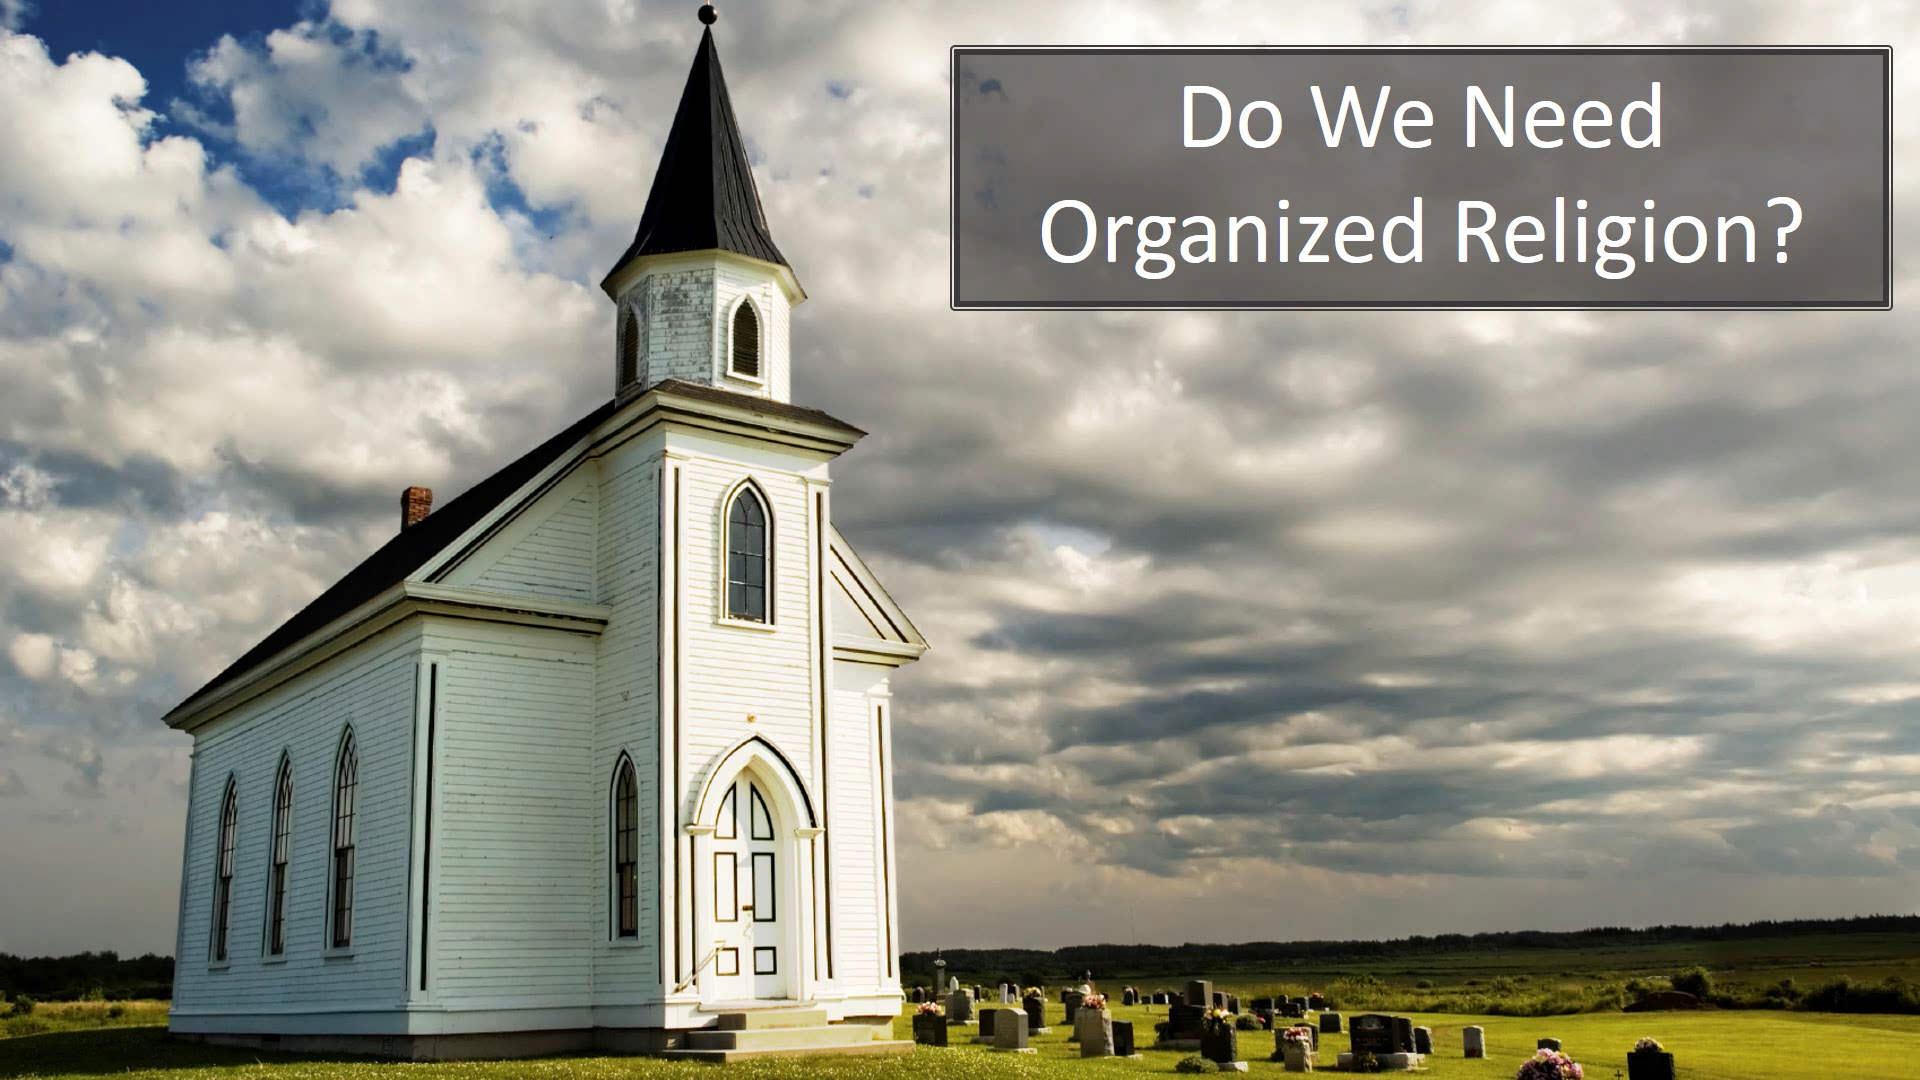 Do We Need Organized Religion?